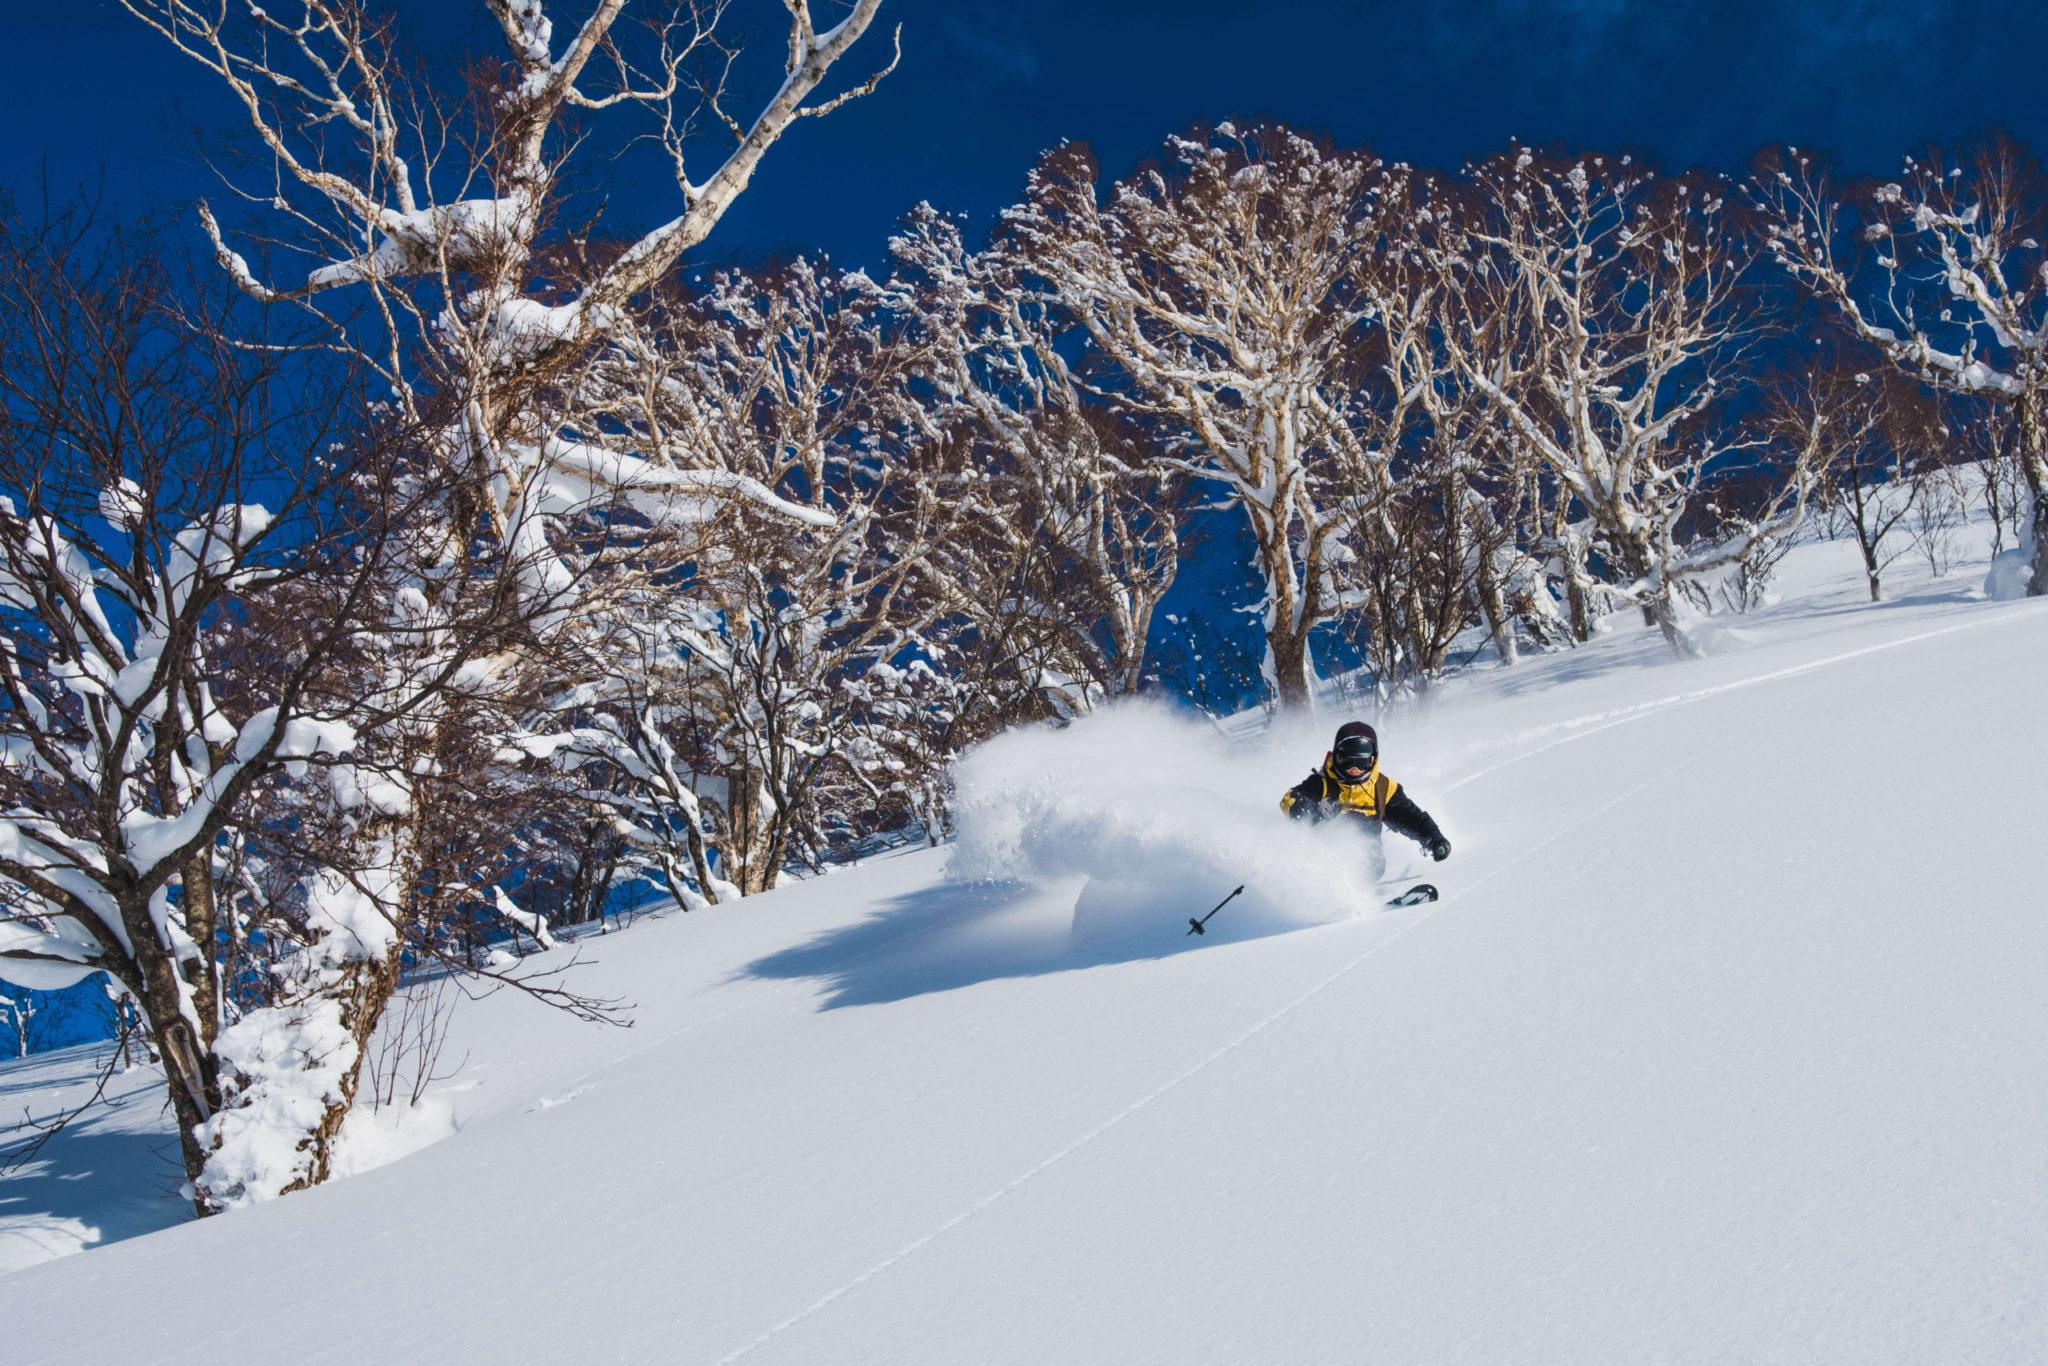 9 day Hokkaido freeride skiing and ski touring holiday in Japan